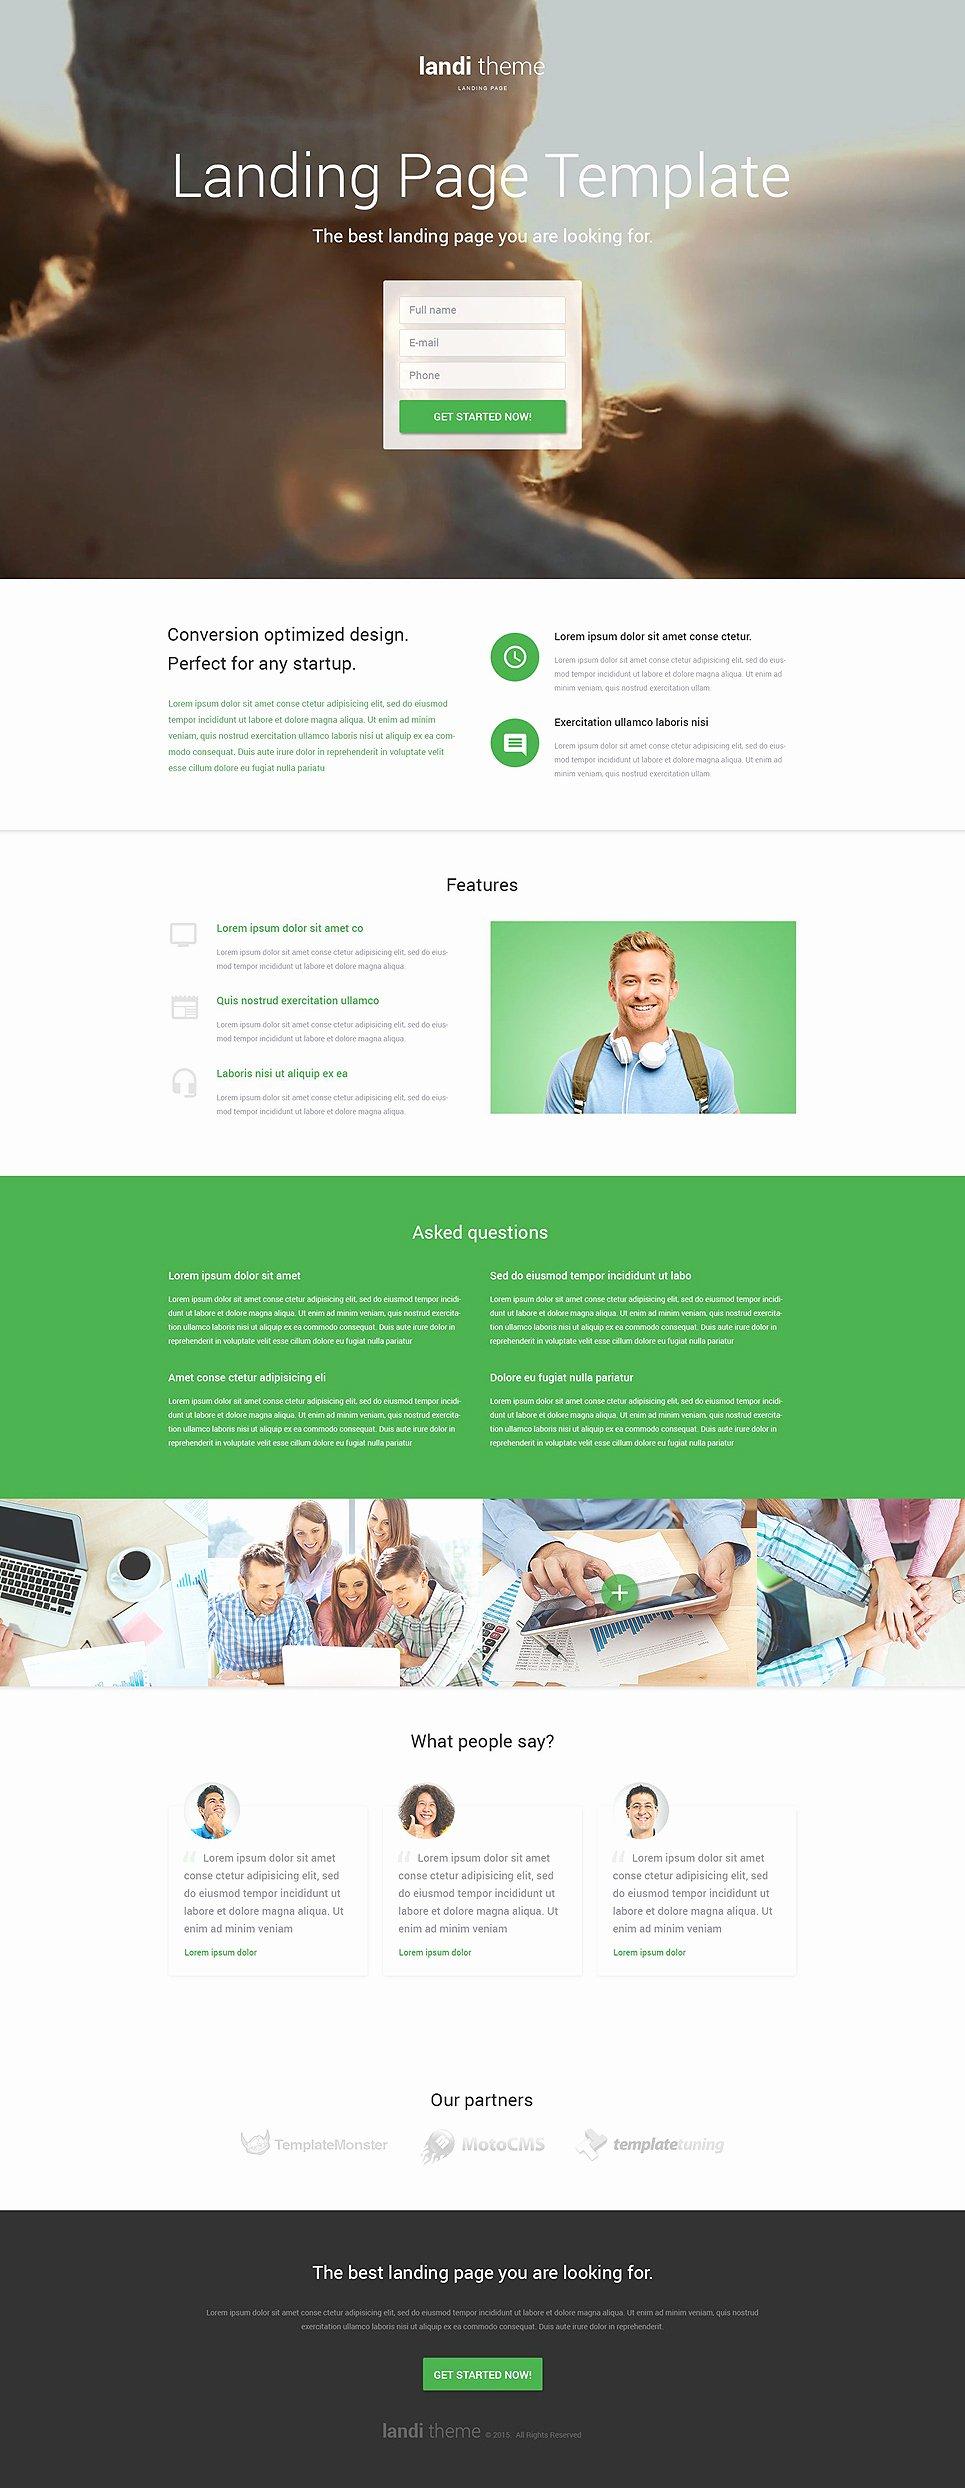 Web Development Responsive Landing Page Template